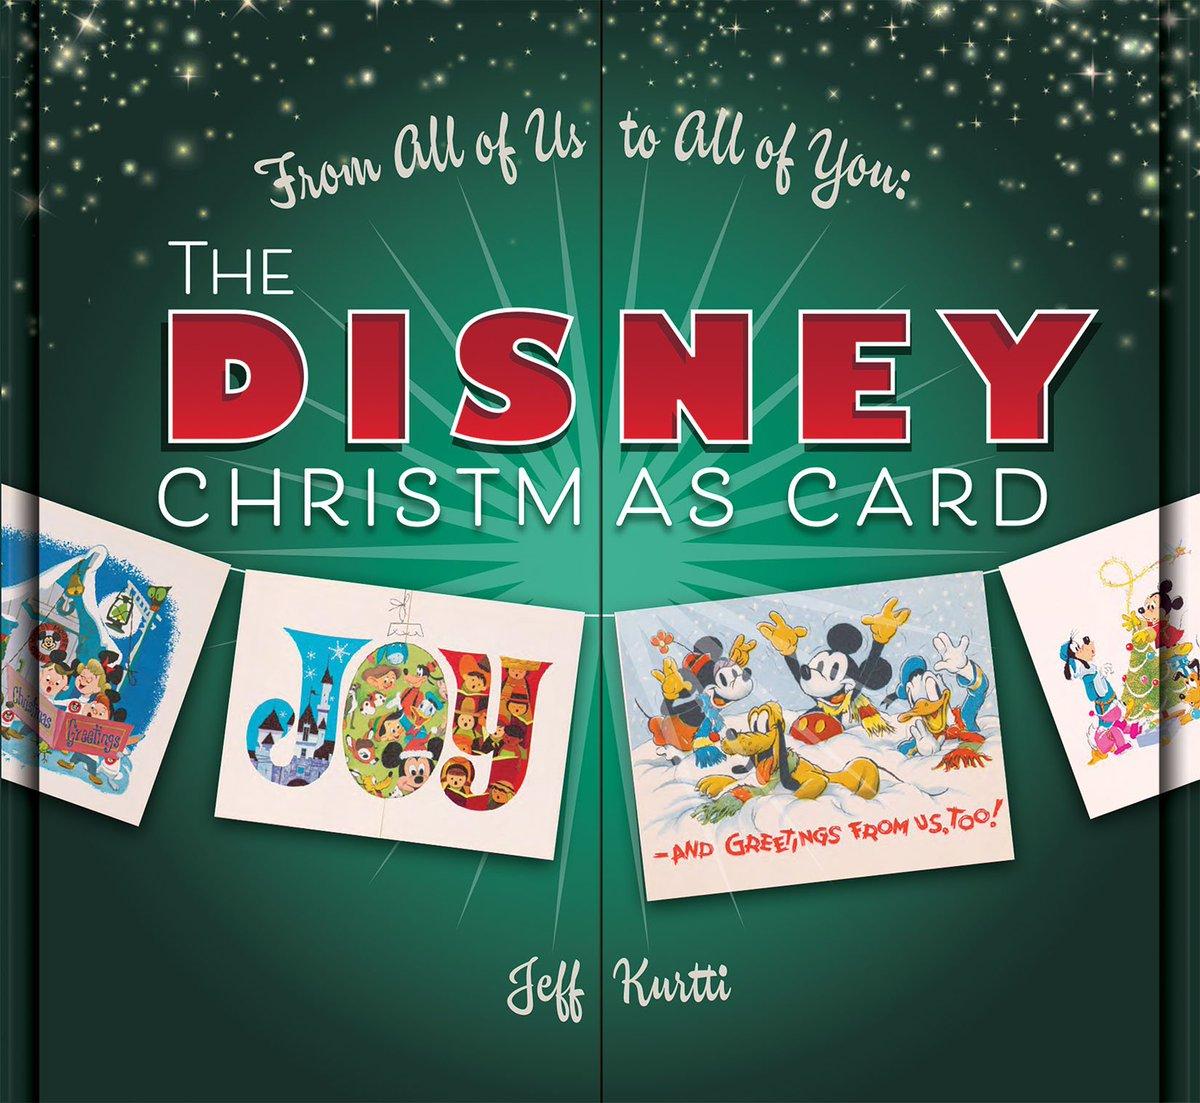 This looks fantastic! amazon.com/Disney-Christm…